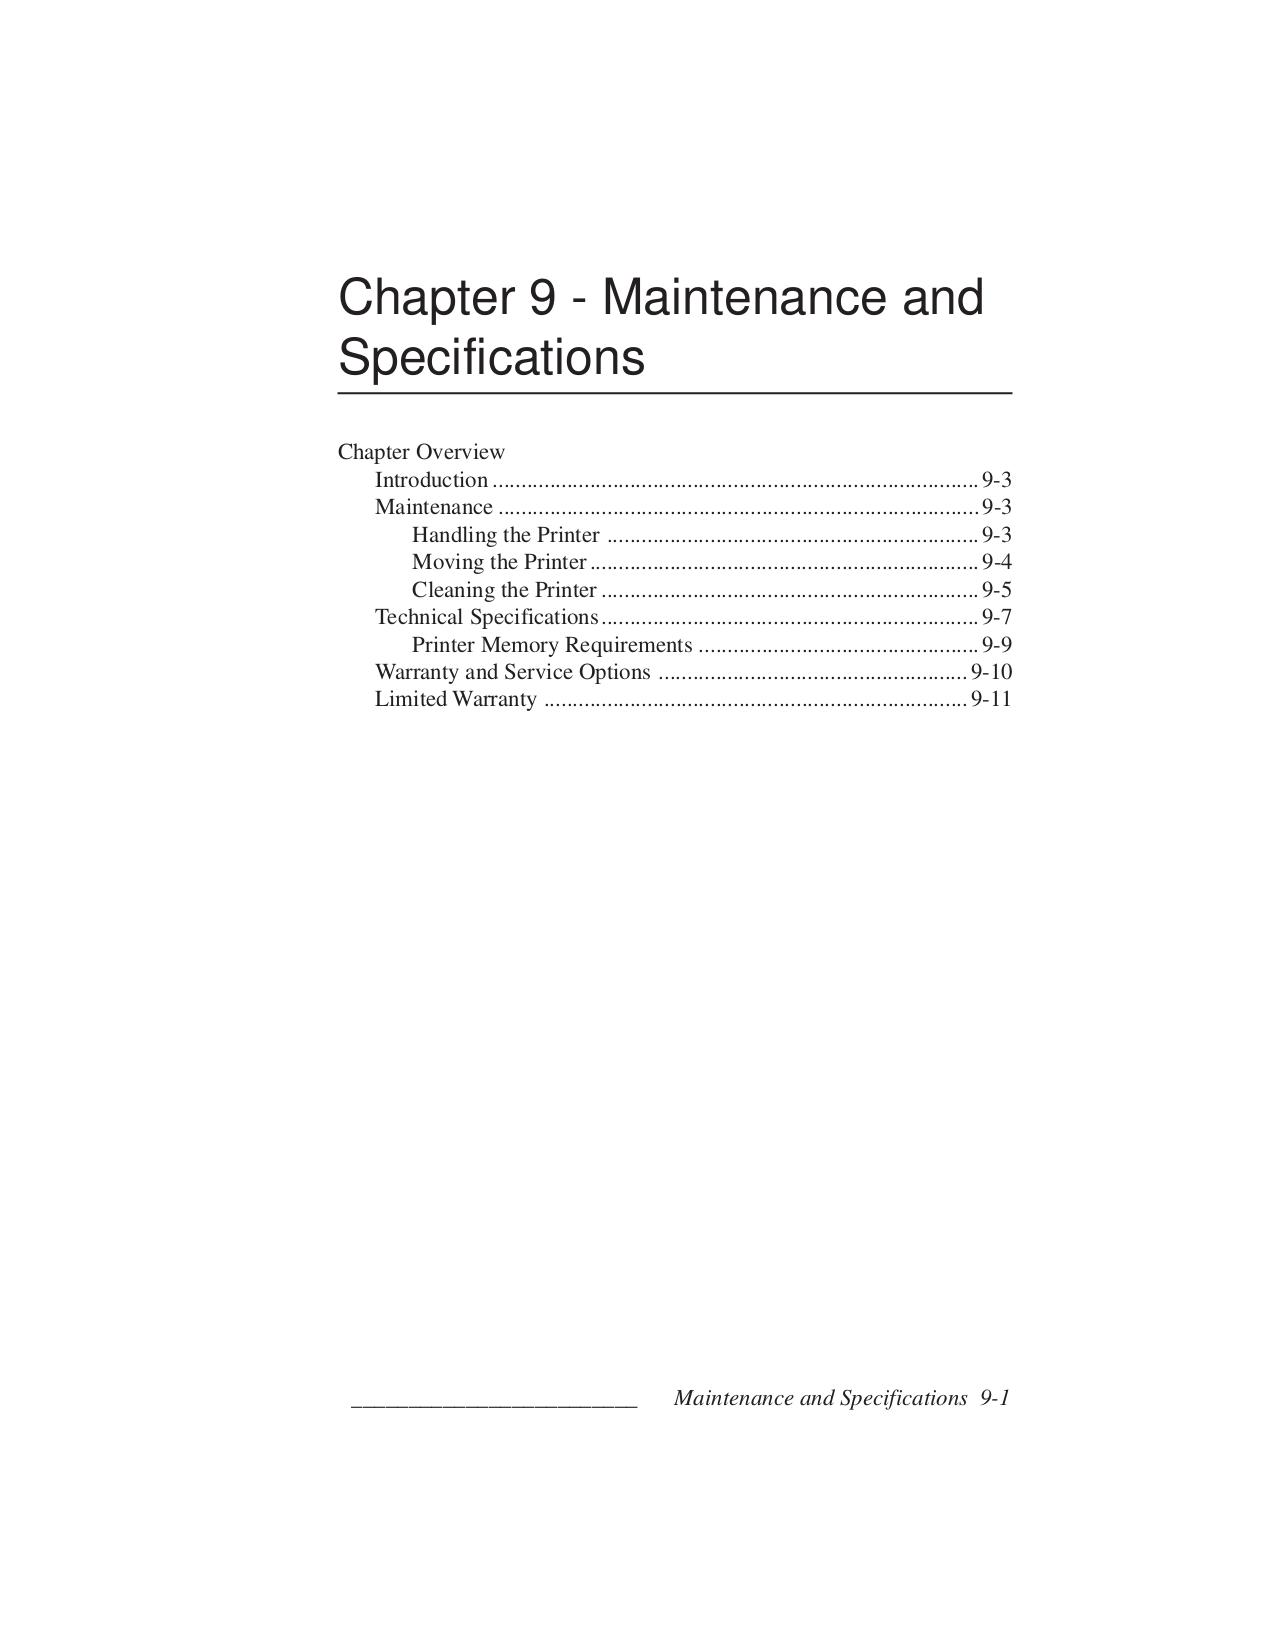 pdf for Xante Printer Accel-a-Writer 8300 manual